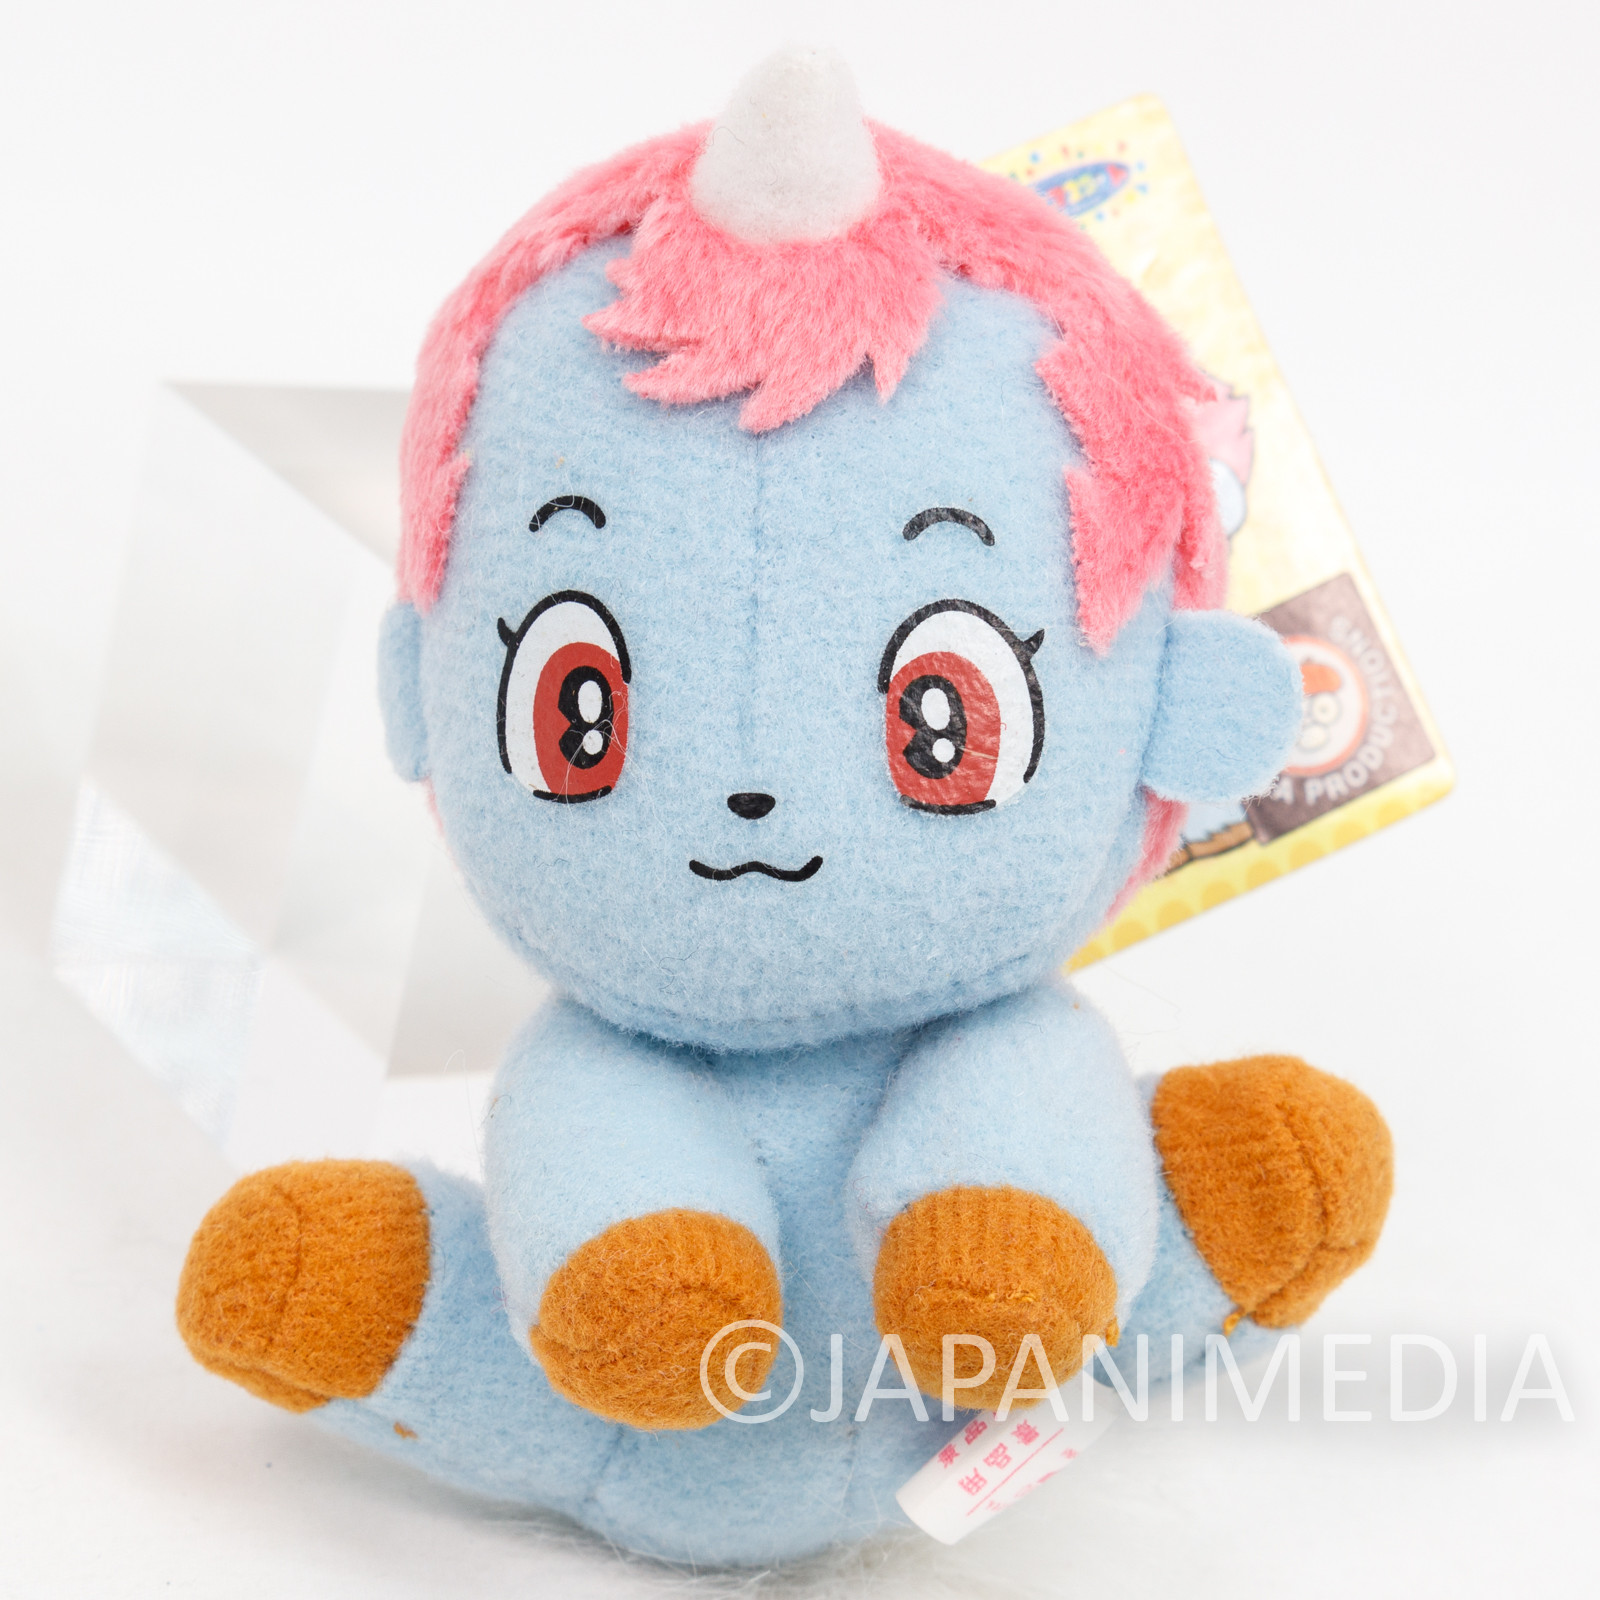 UNICO Mini Plush Doll Keychain Tezuka Osamu Banpresto JAPAN ANIME